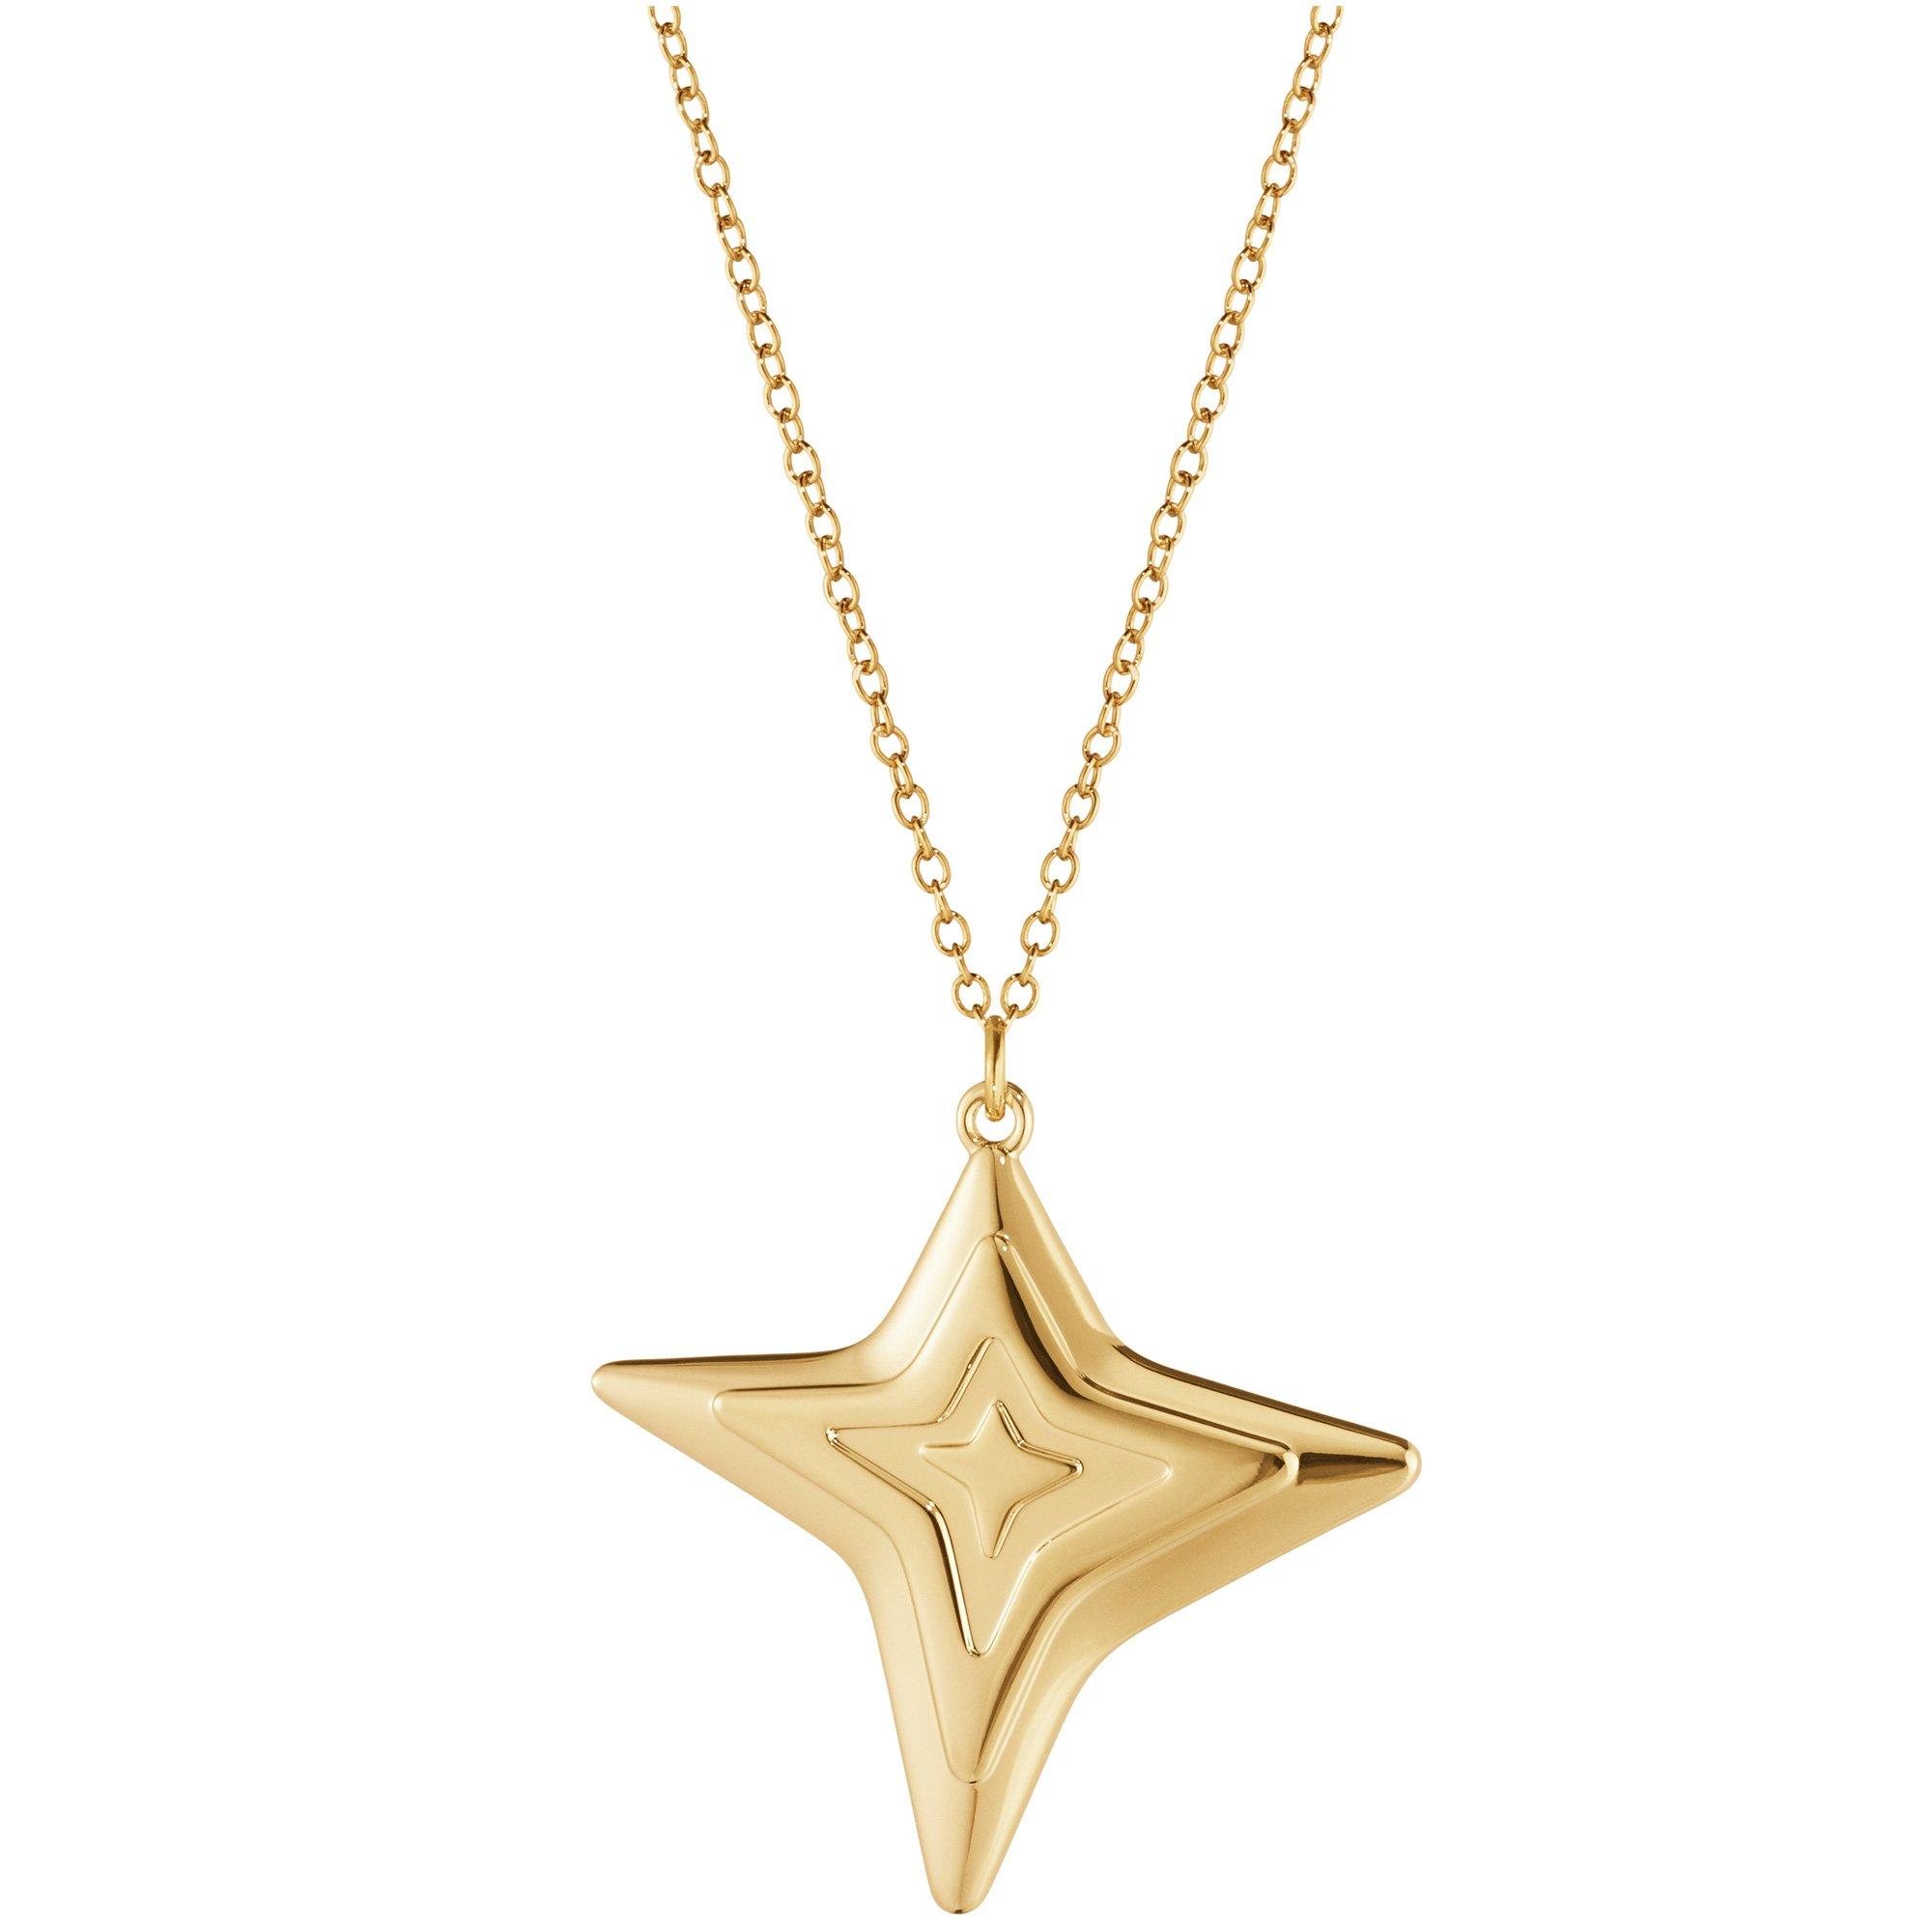 Georg Jensen 2021 fyra spetsar Ornament guld